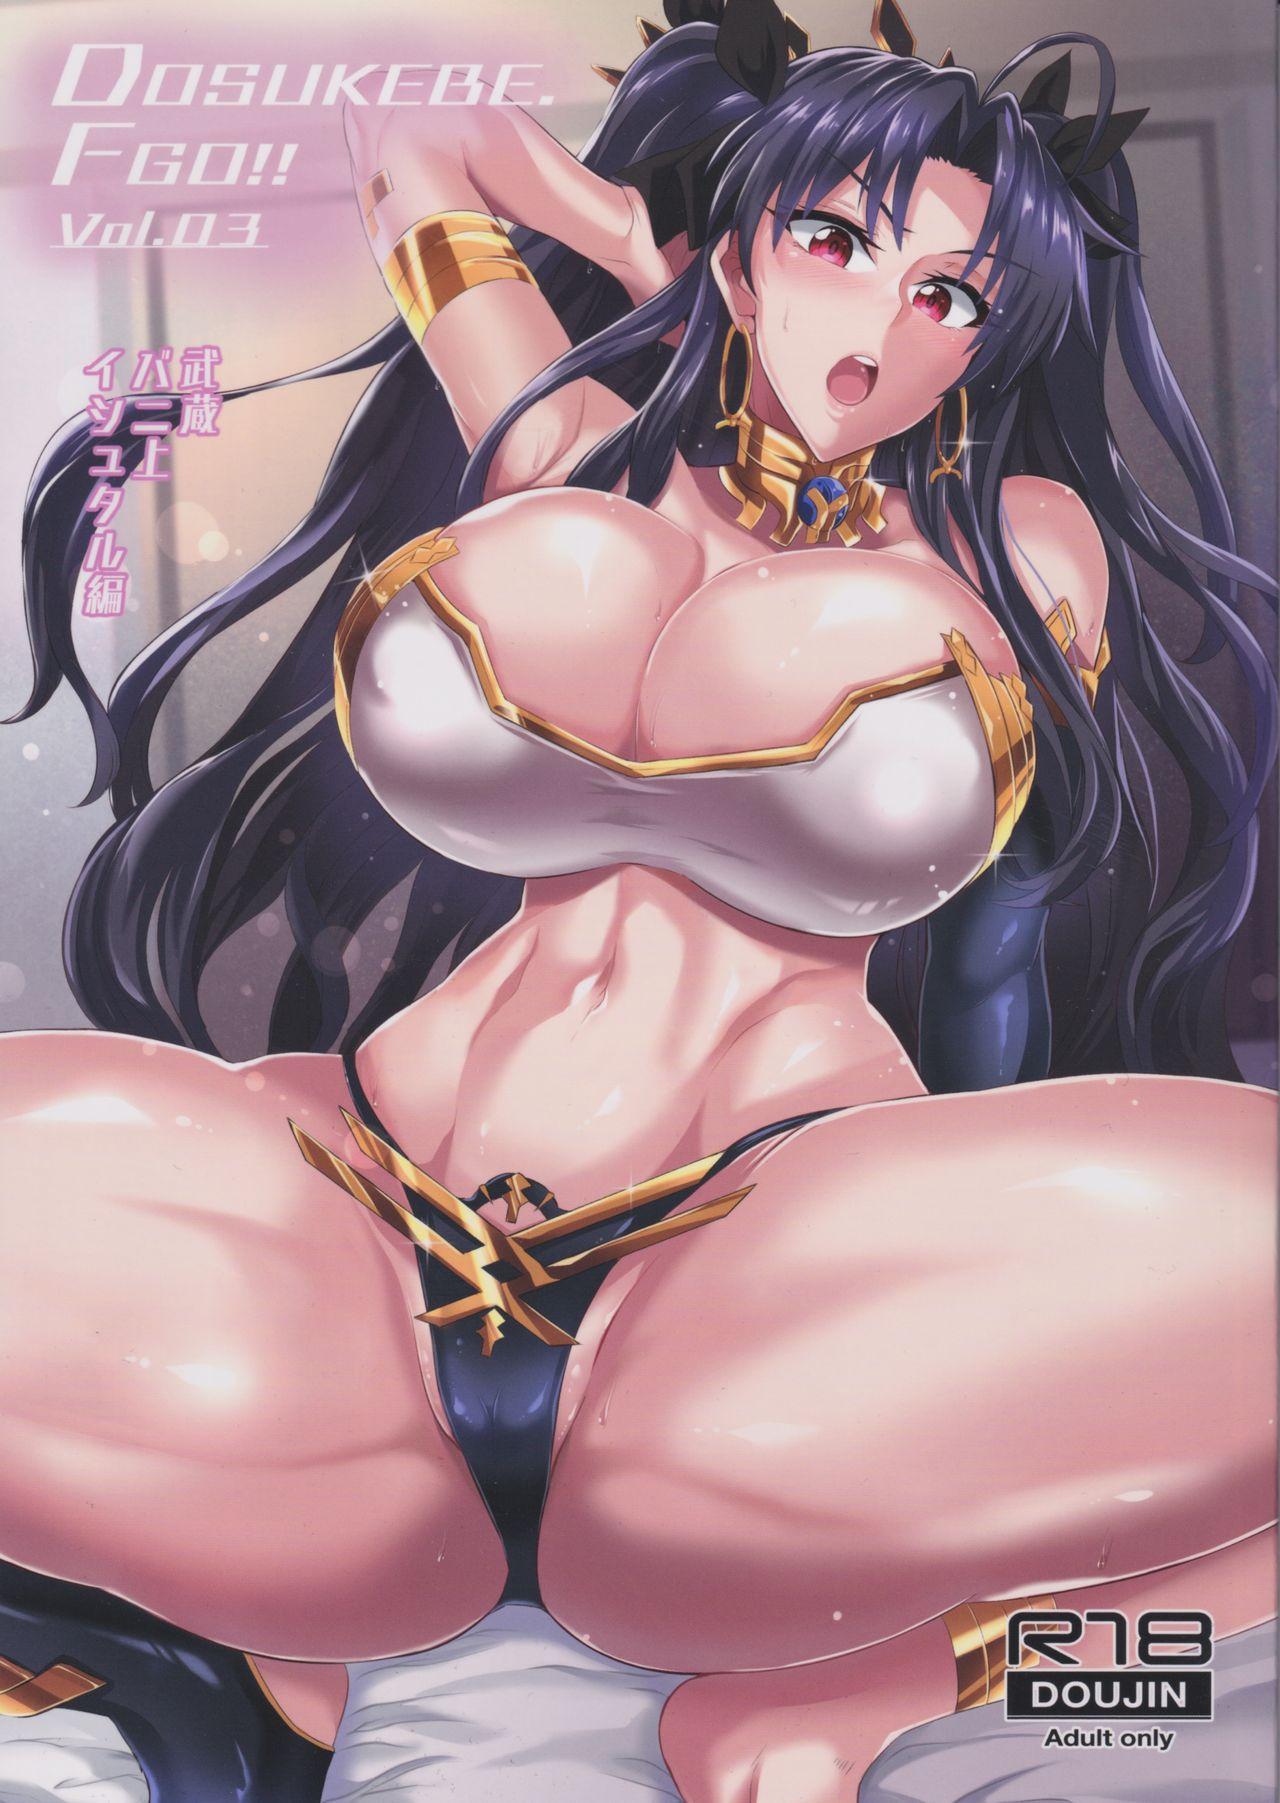 DOSUKEBE. FGO!! Vol. 03 Musashi Bunnyue Ishtar Hen 0